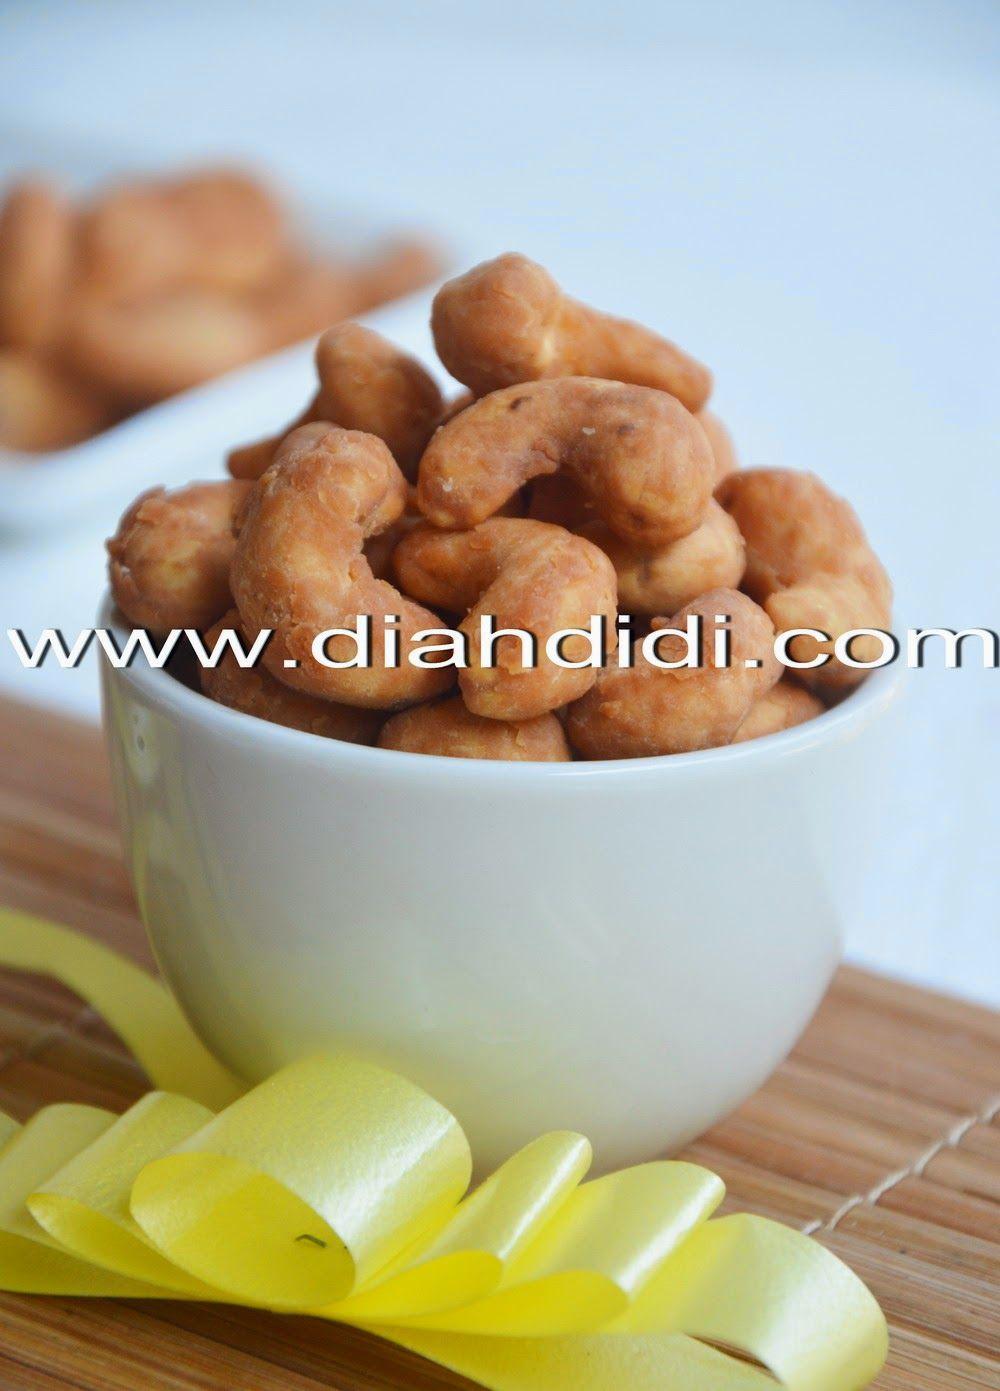 Kacang Mede Telur Pedas Resep Masakan Kacang Ide Makanan